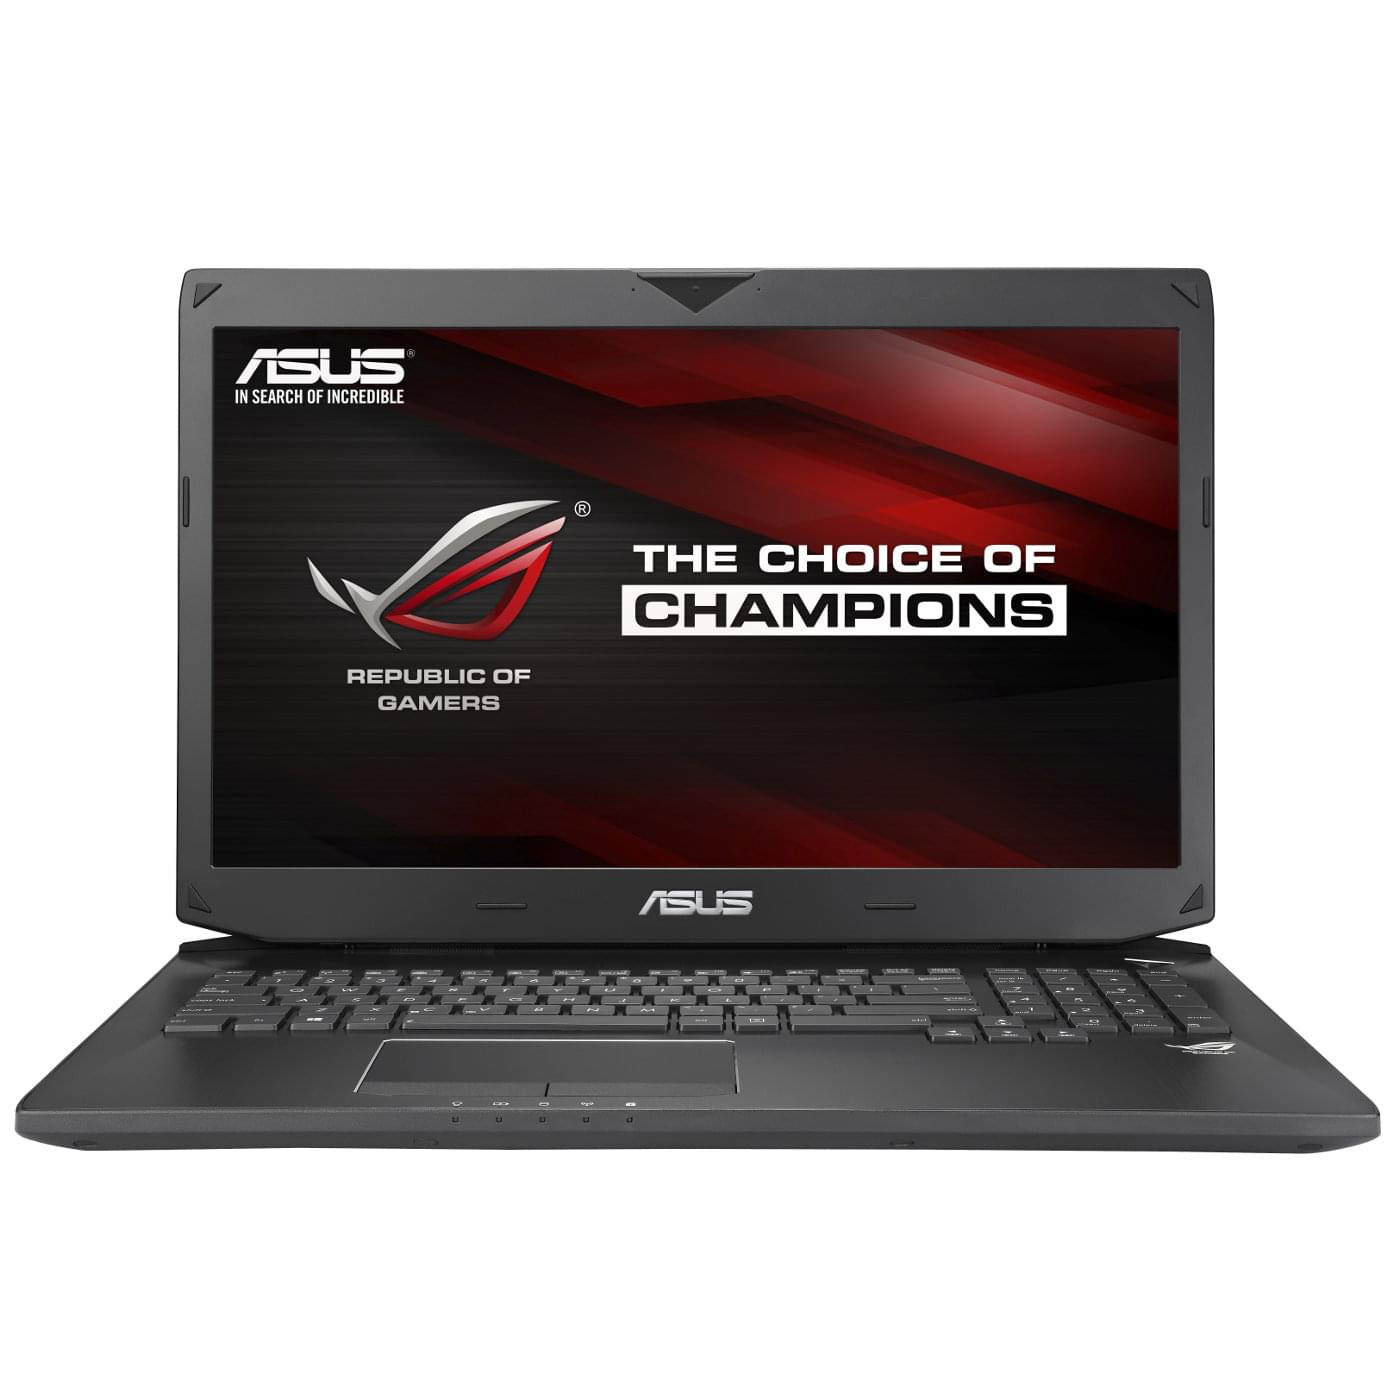 "Asus G750JZ-T4146H -i7-4860/16G/256G+1To/GTX880/17.3""/8 (G750JZ-T4146H) - Achat / Vente PC Portable sur Cybertek.fr - 0"